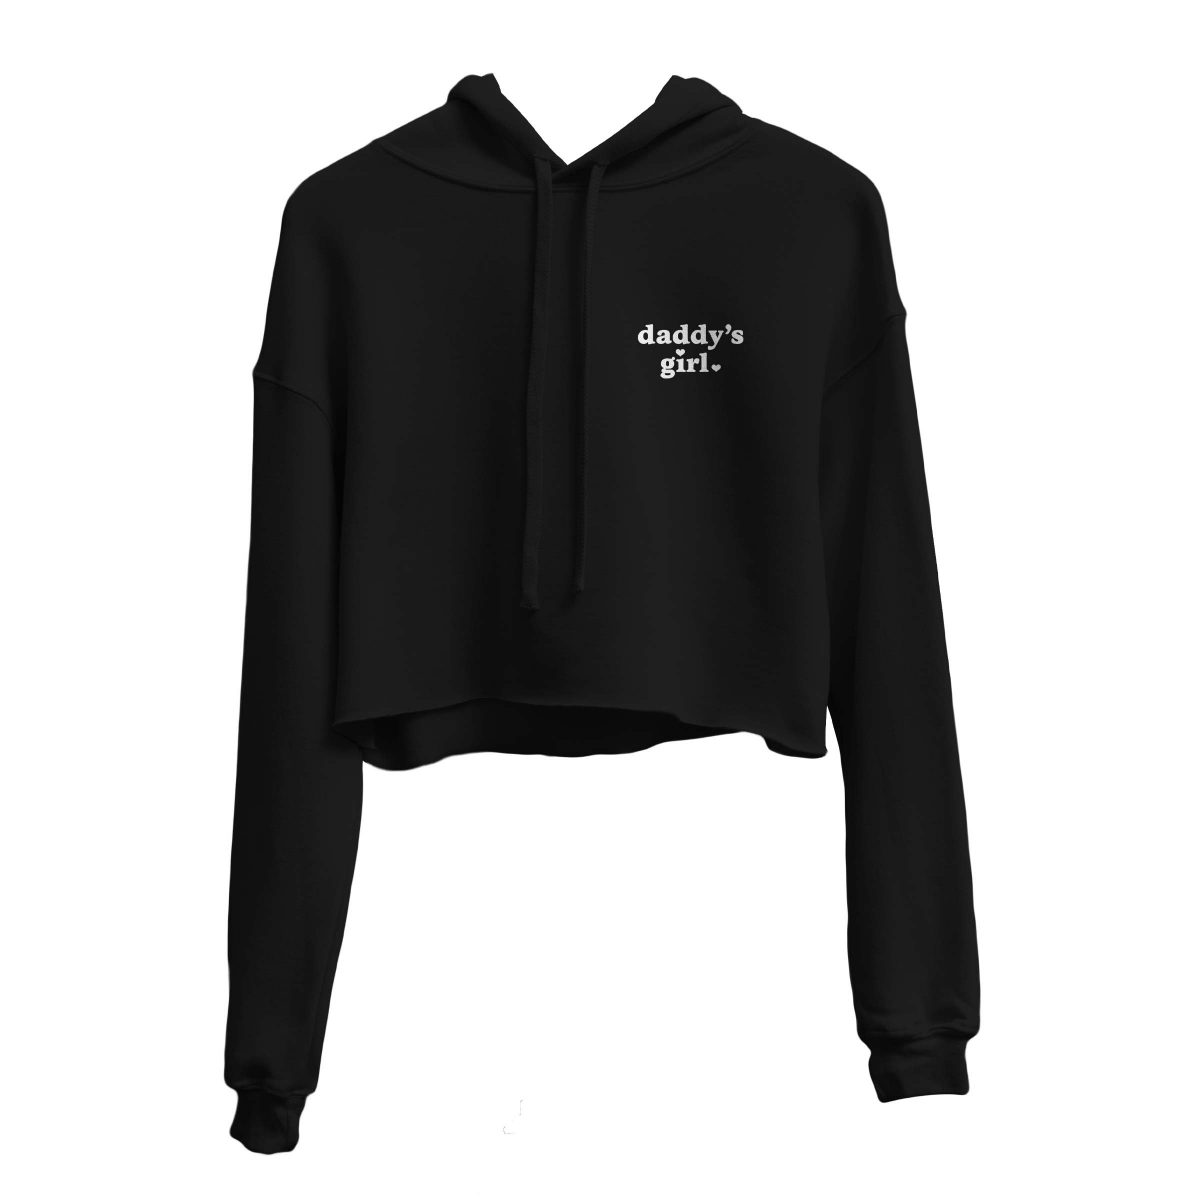 DADDYS GIRL crop hoodie by kikicutt